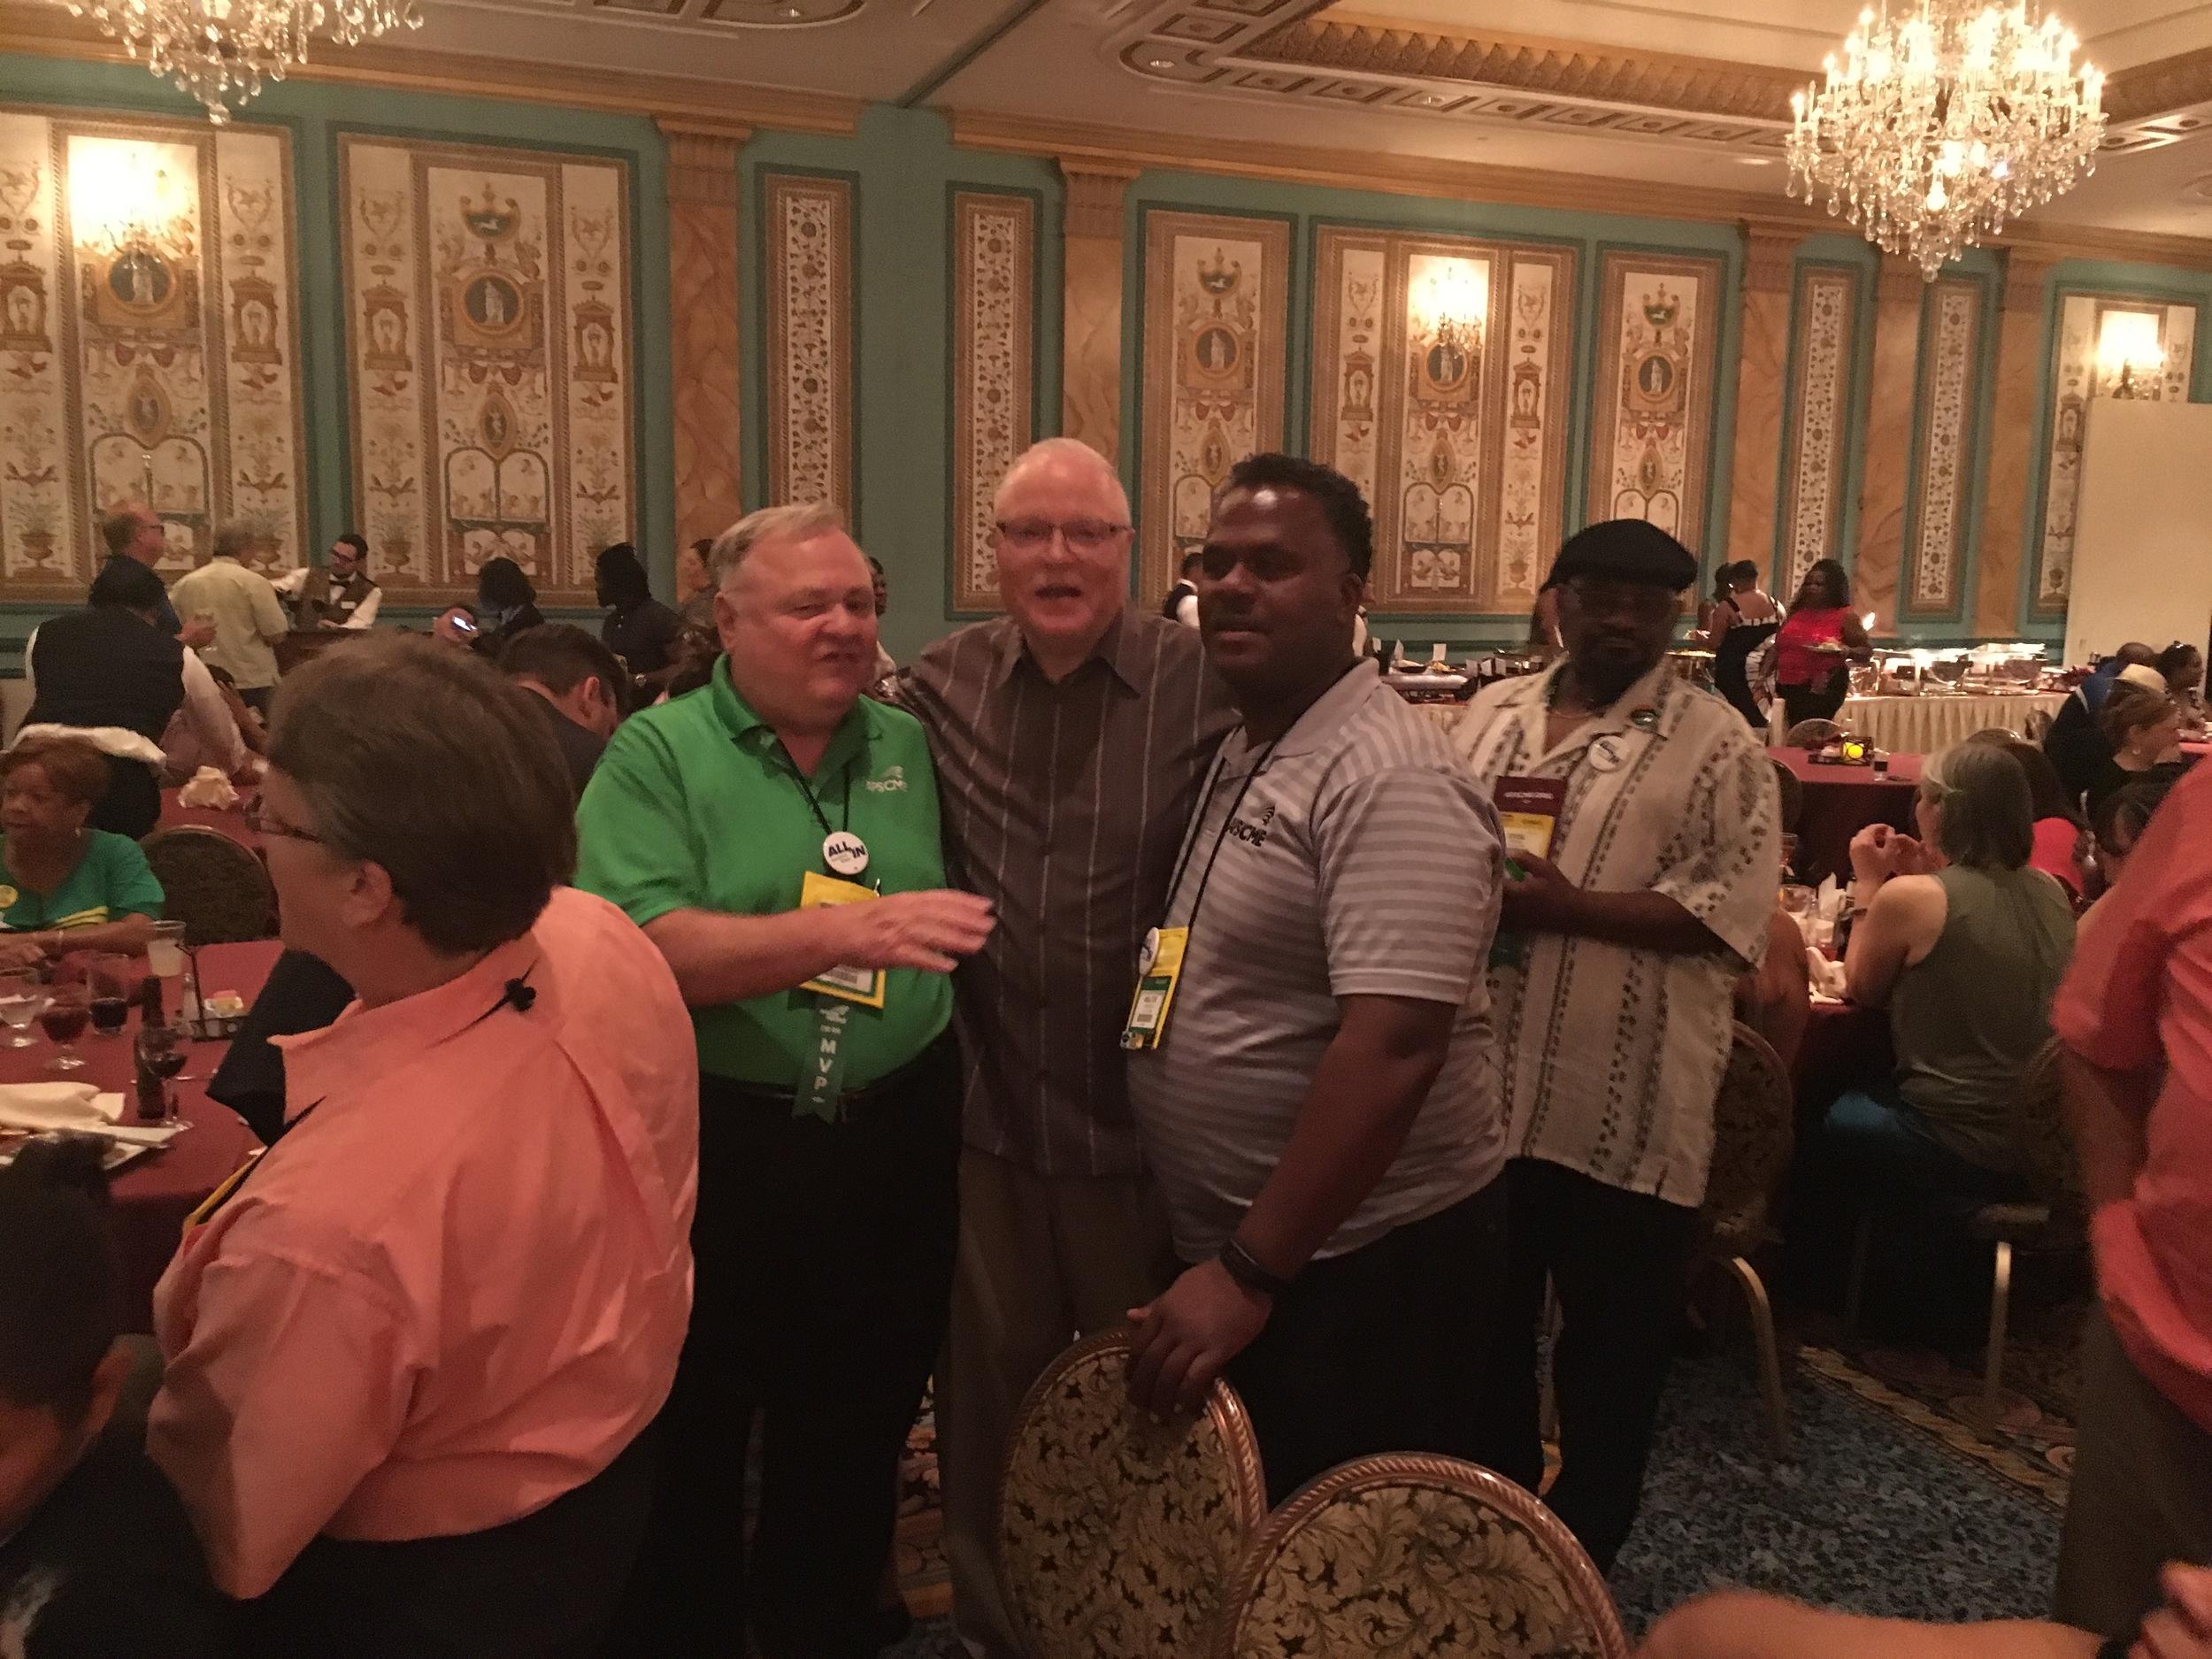 Presidential meeting:  Pictured from left: Roman Ulman, Lee Saunders, Walter Crenshaw